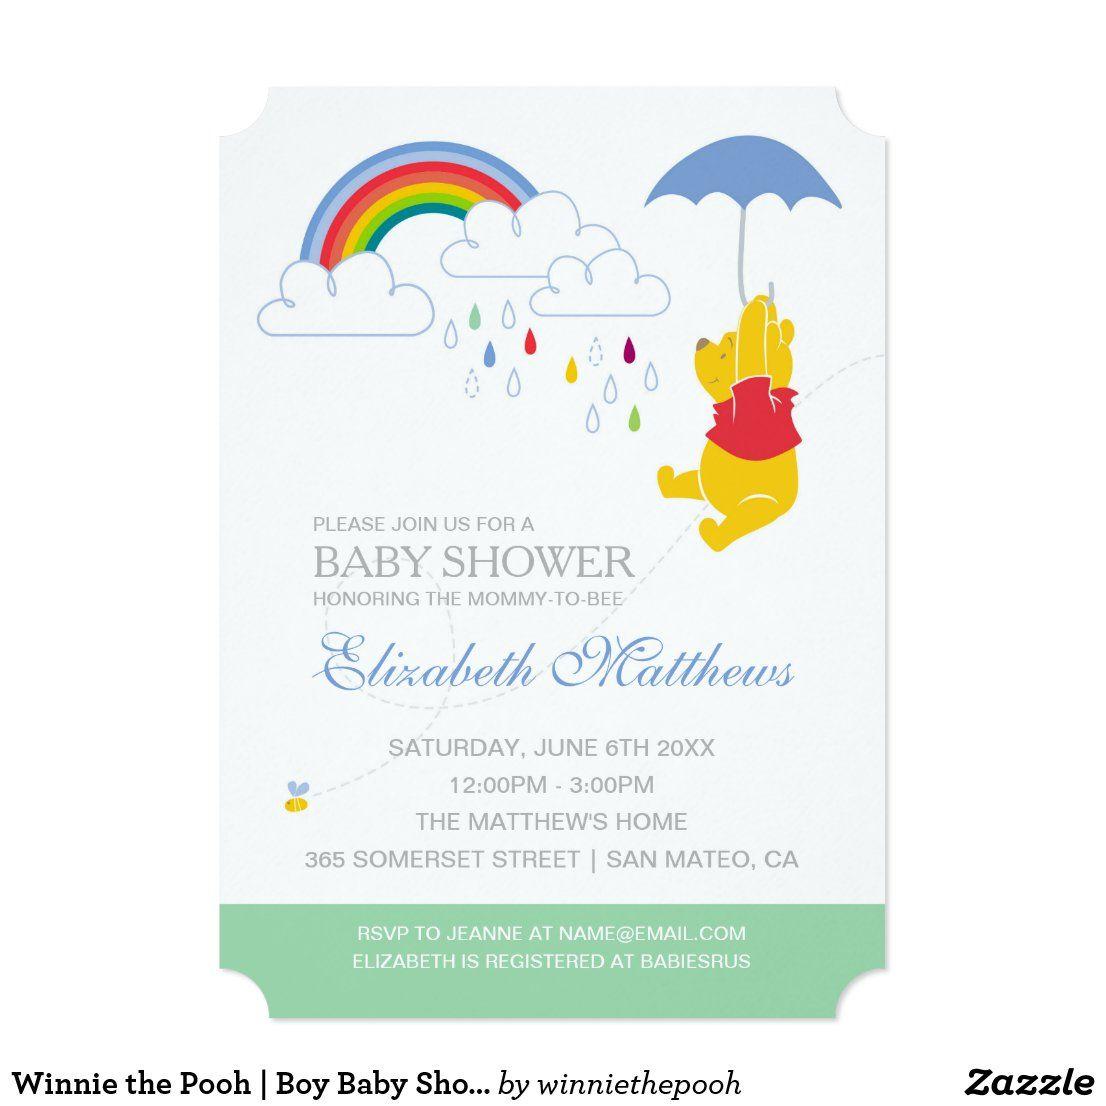 Winnie the Pooh | Boy Baby Shower Invitation | Zazzle.com